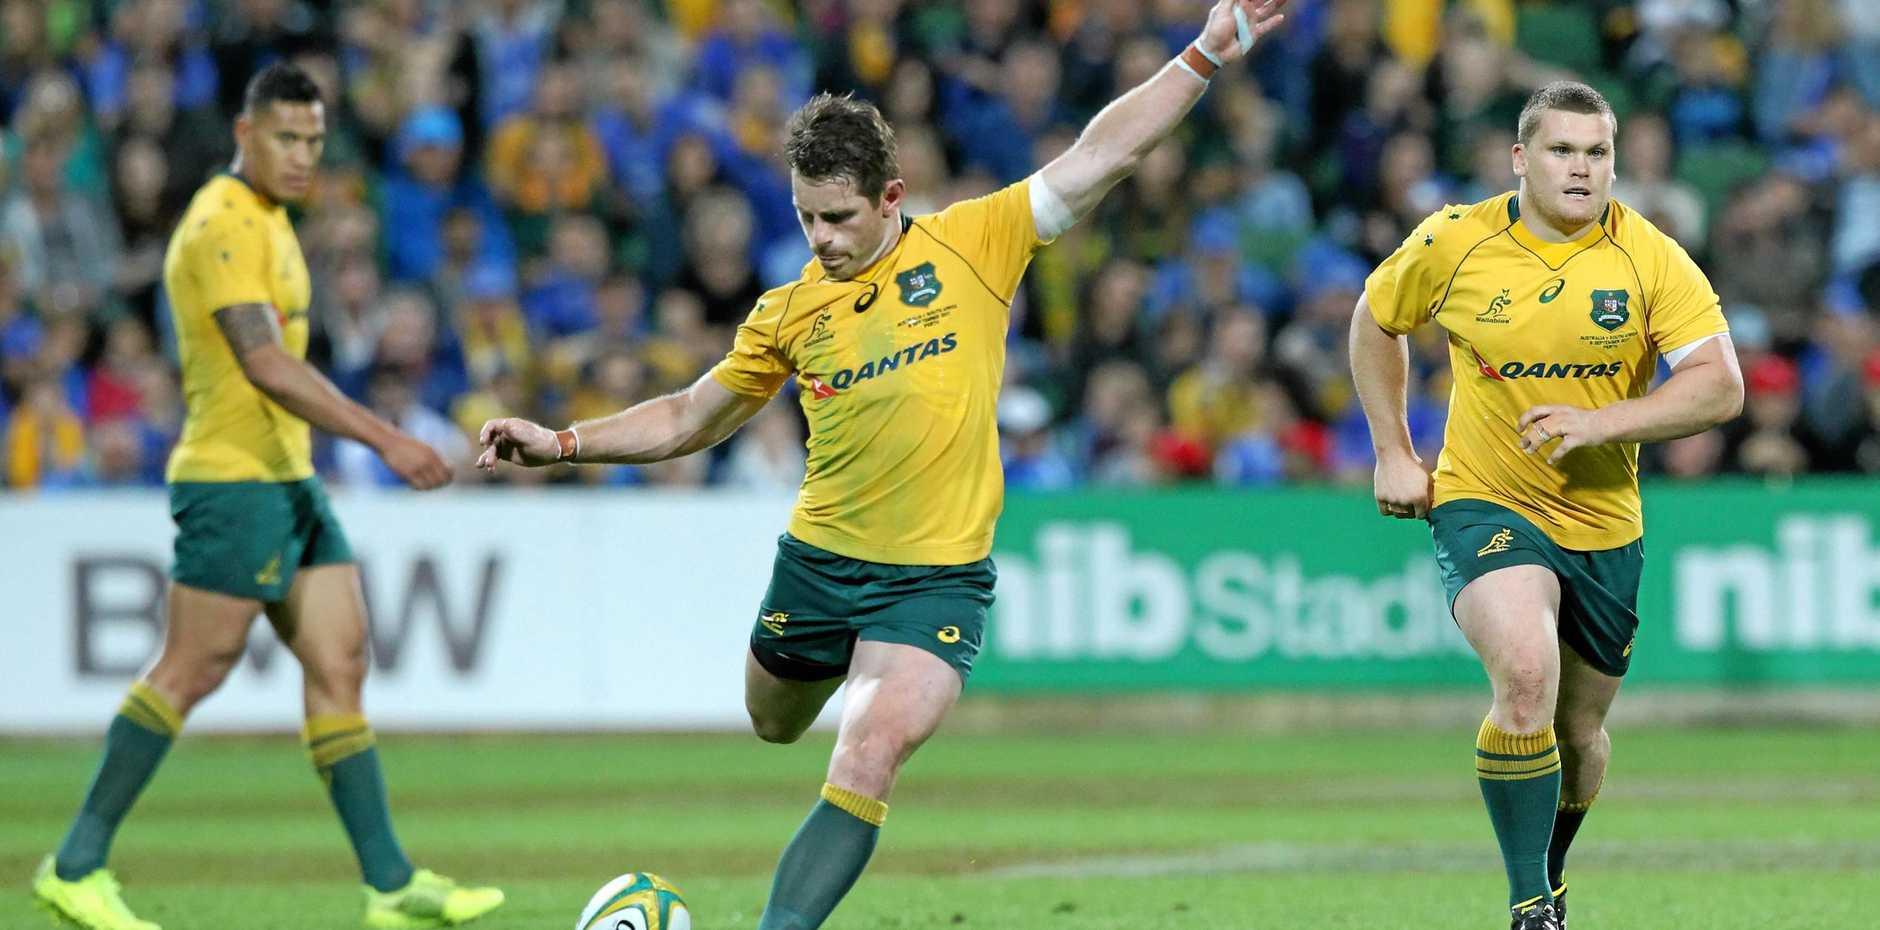 Bernard Foley kicks a goal against the Springboks in the draw in Perth.